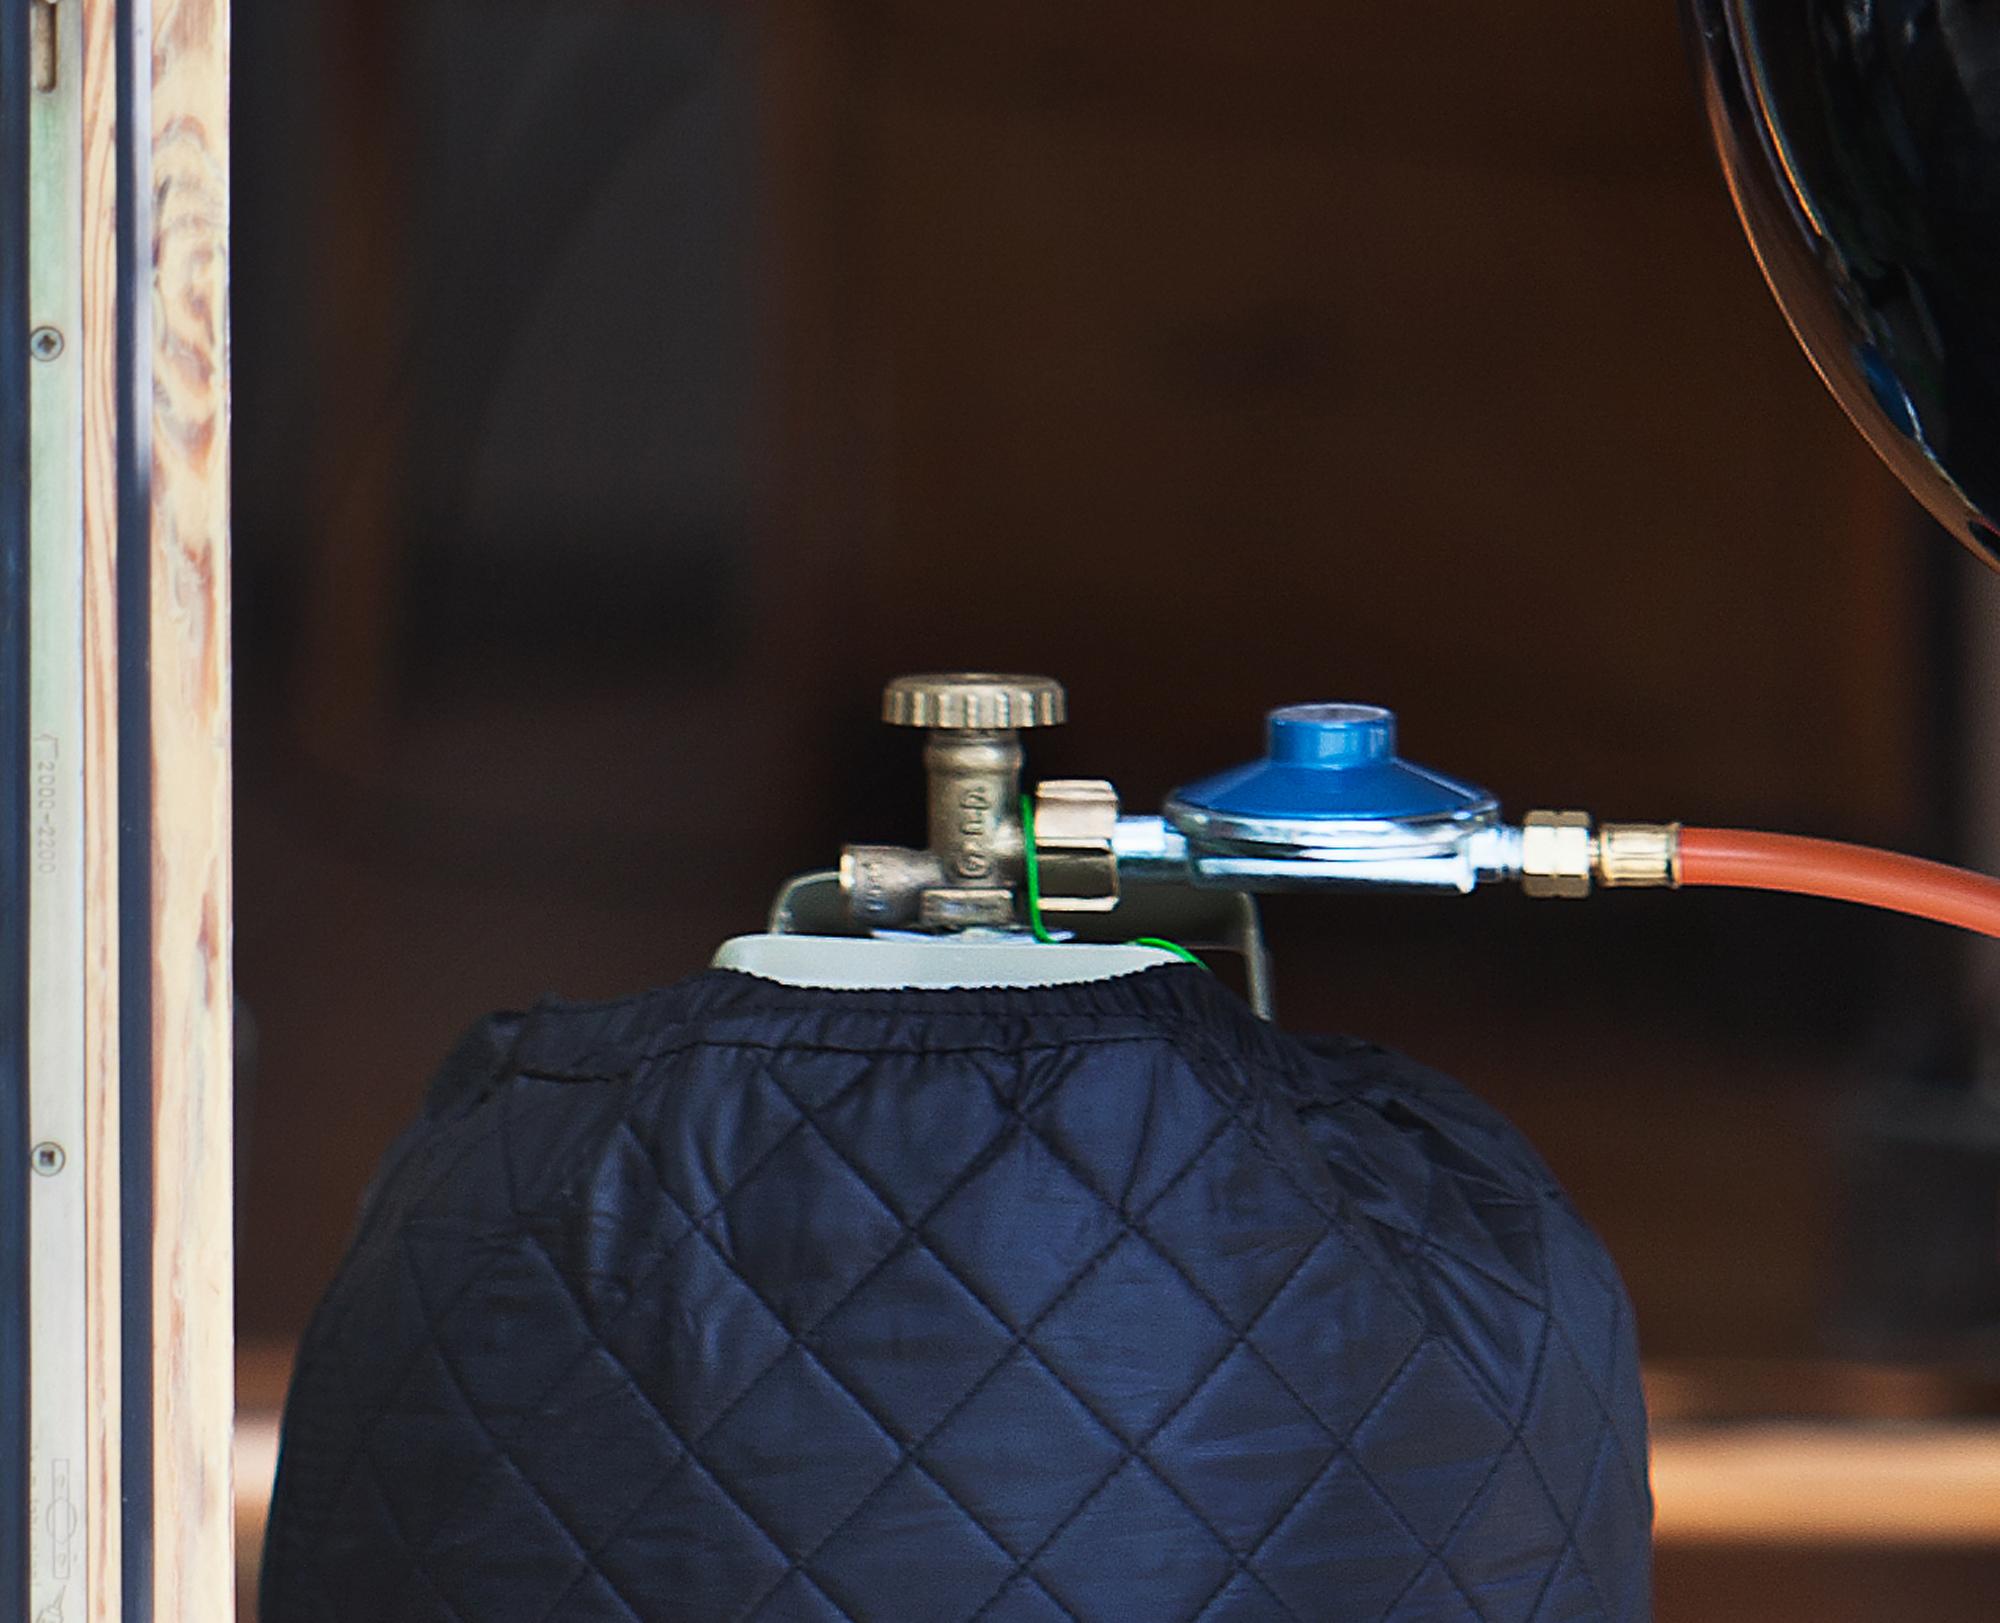 Landmann Gasgrill At : Gasgrill zubehör shop druckminderer gasschläuche uvm